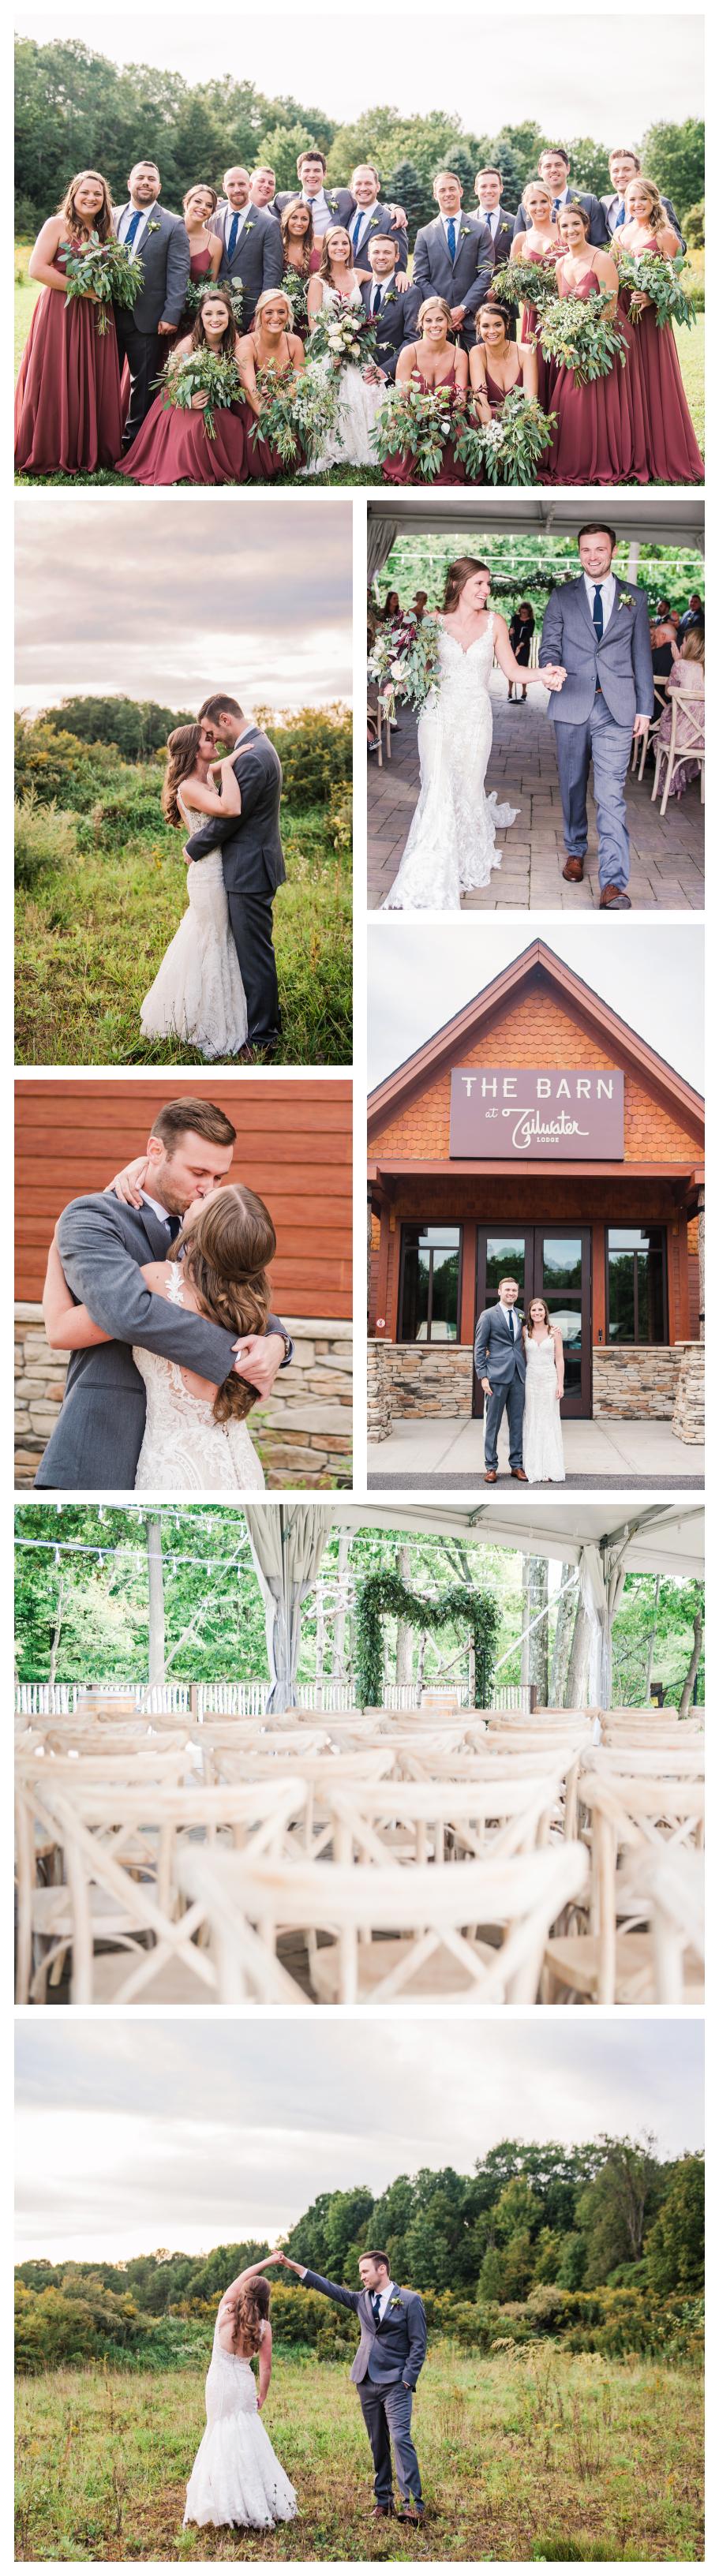 Tailwater_Lodge_Rochester_Wedding_JILL_STUDIO_1.jpg